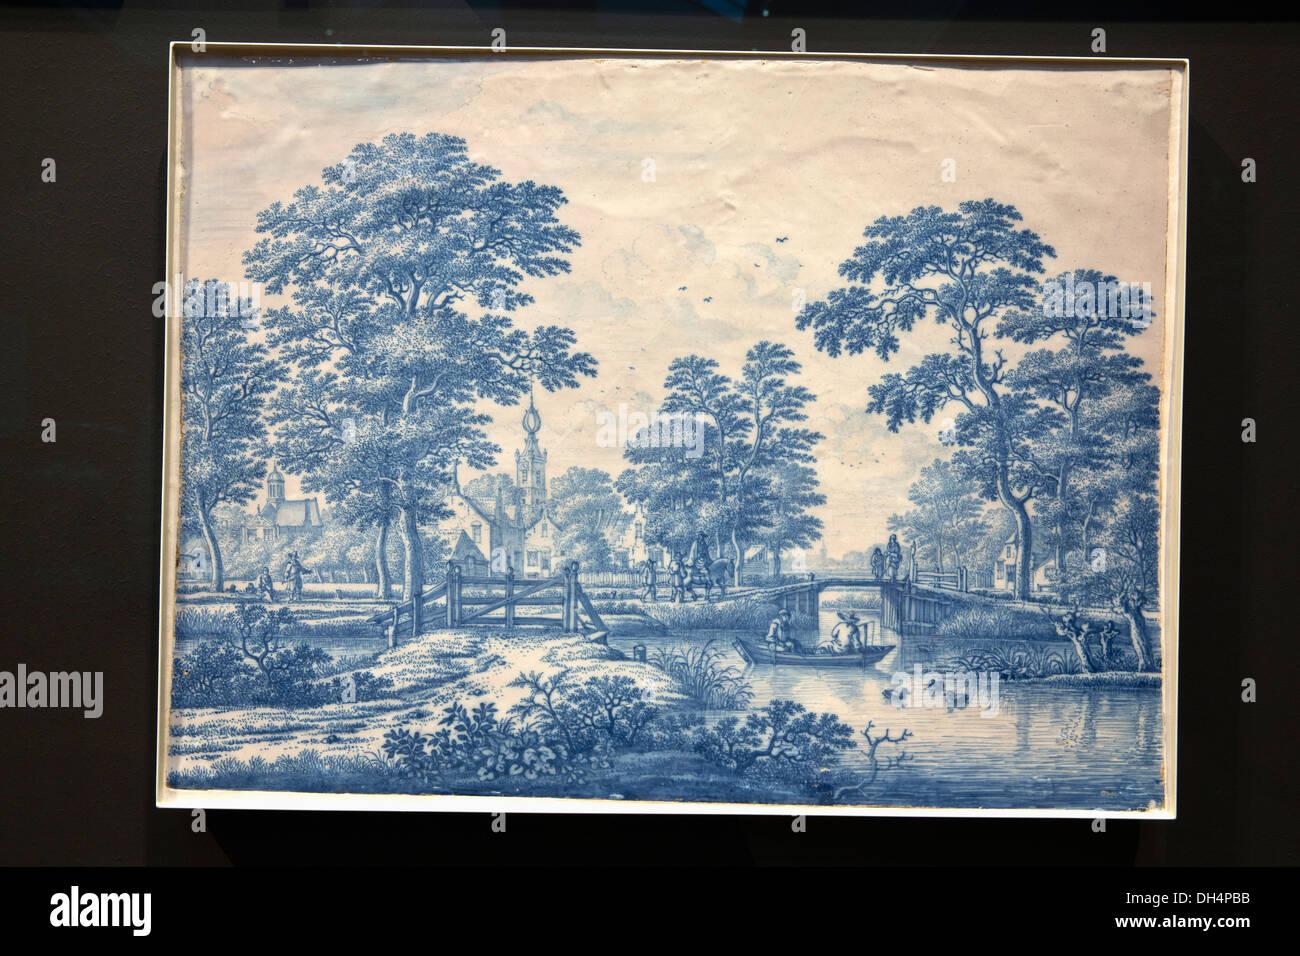 Netherlands, Amsterdam, Rijksmuseum. Delft's Blue tin-glazed earthenware ( faience ).View of Overschie near Rotterdam - Stock Image